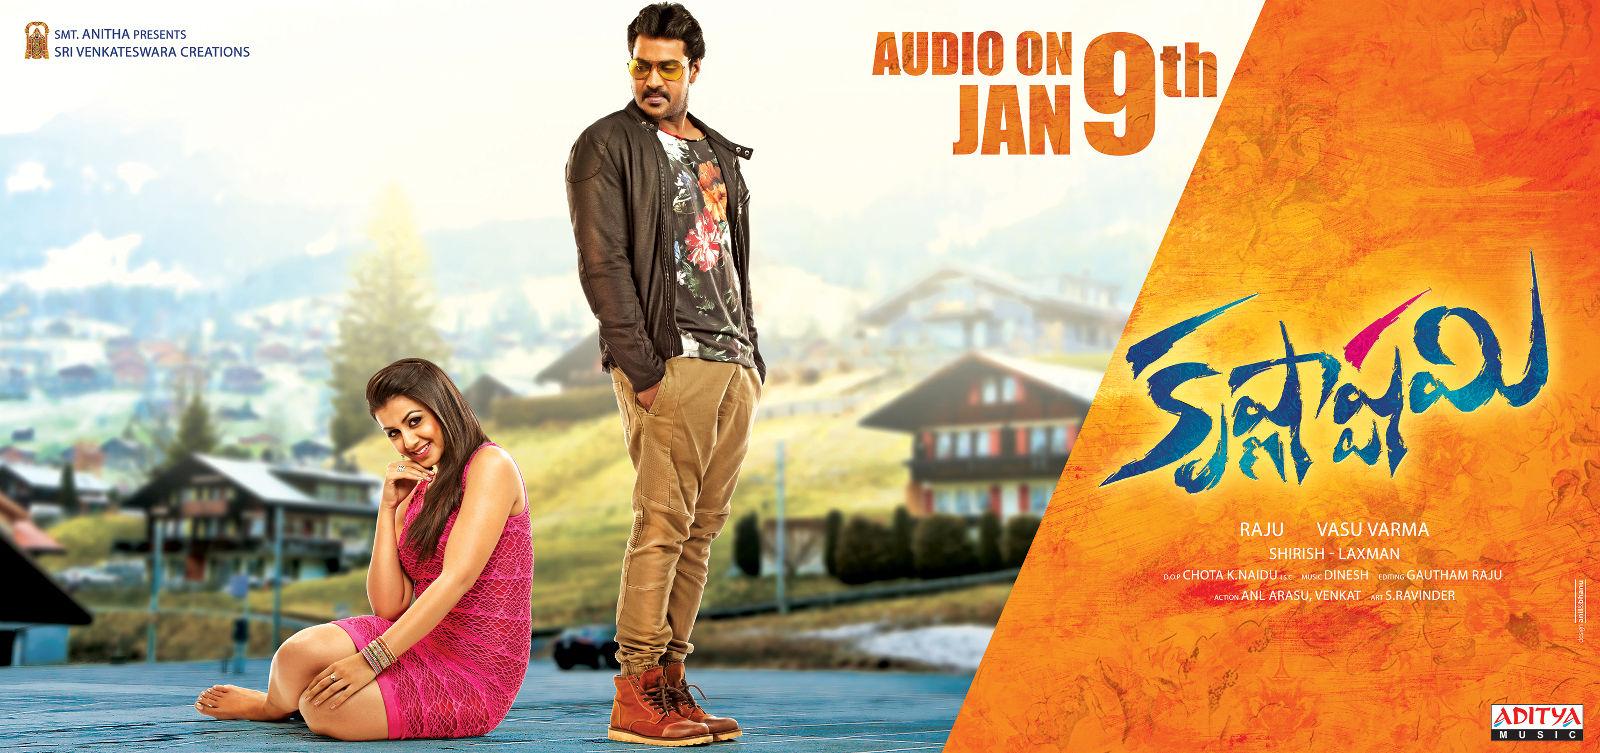 Nikki Galrani & Sunil in Krishnashtami Movie Audio on Jan 9th Wallpaper